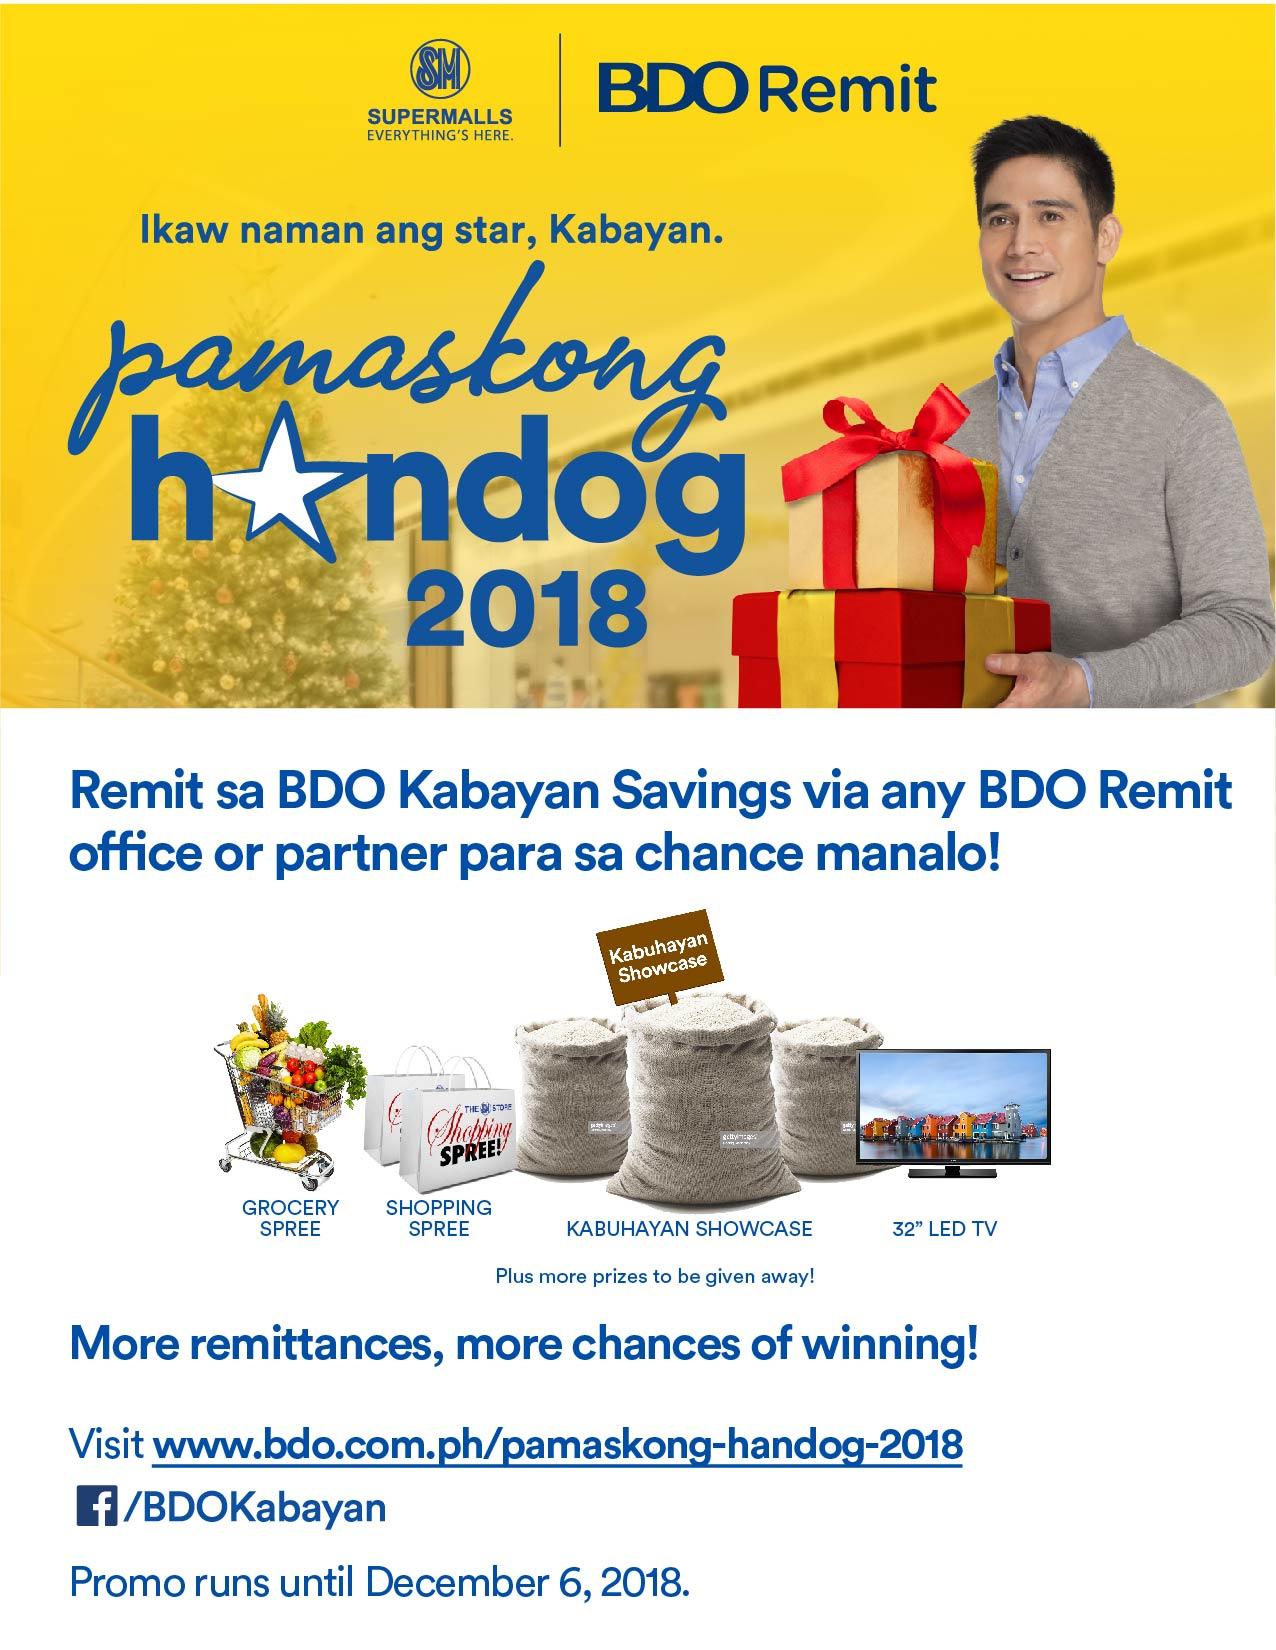 BDO Pamaskong Handog 2018